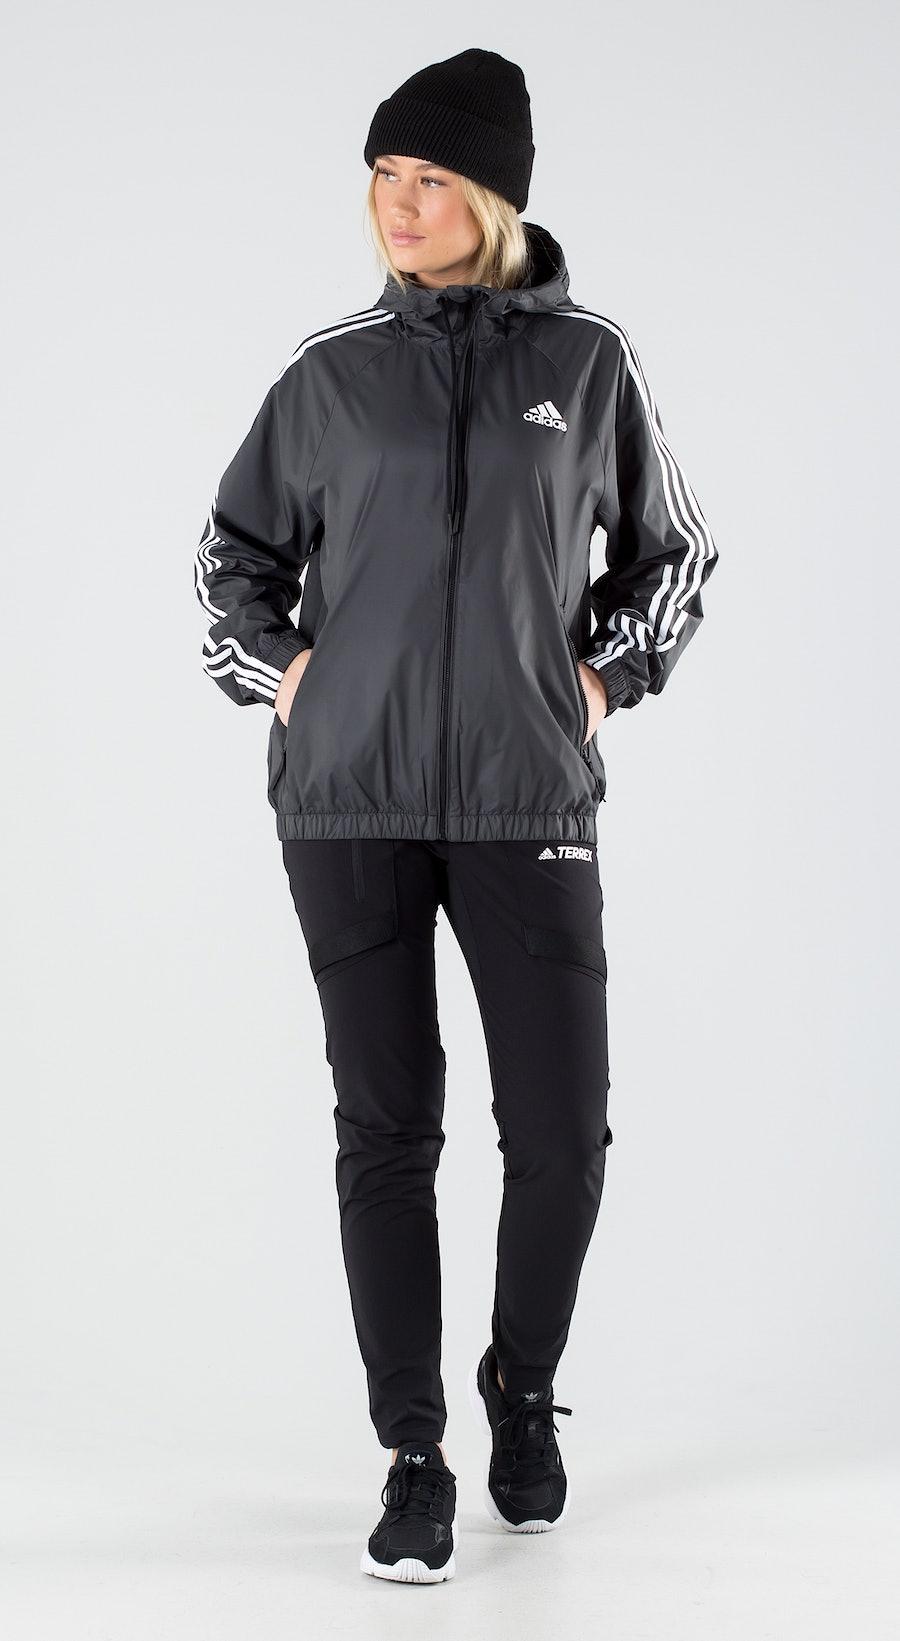 Adidas Terrex BSC 3 Stripes Wind Black Outfit Multi